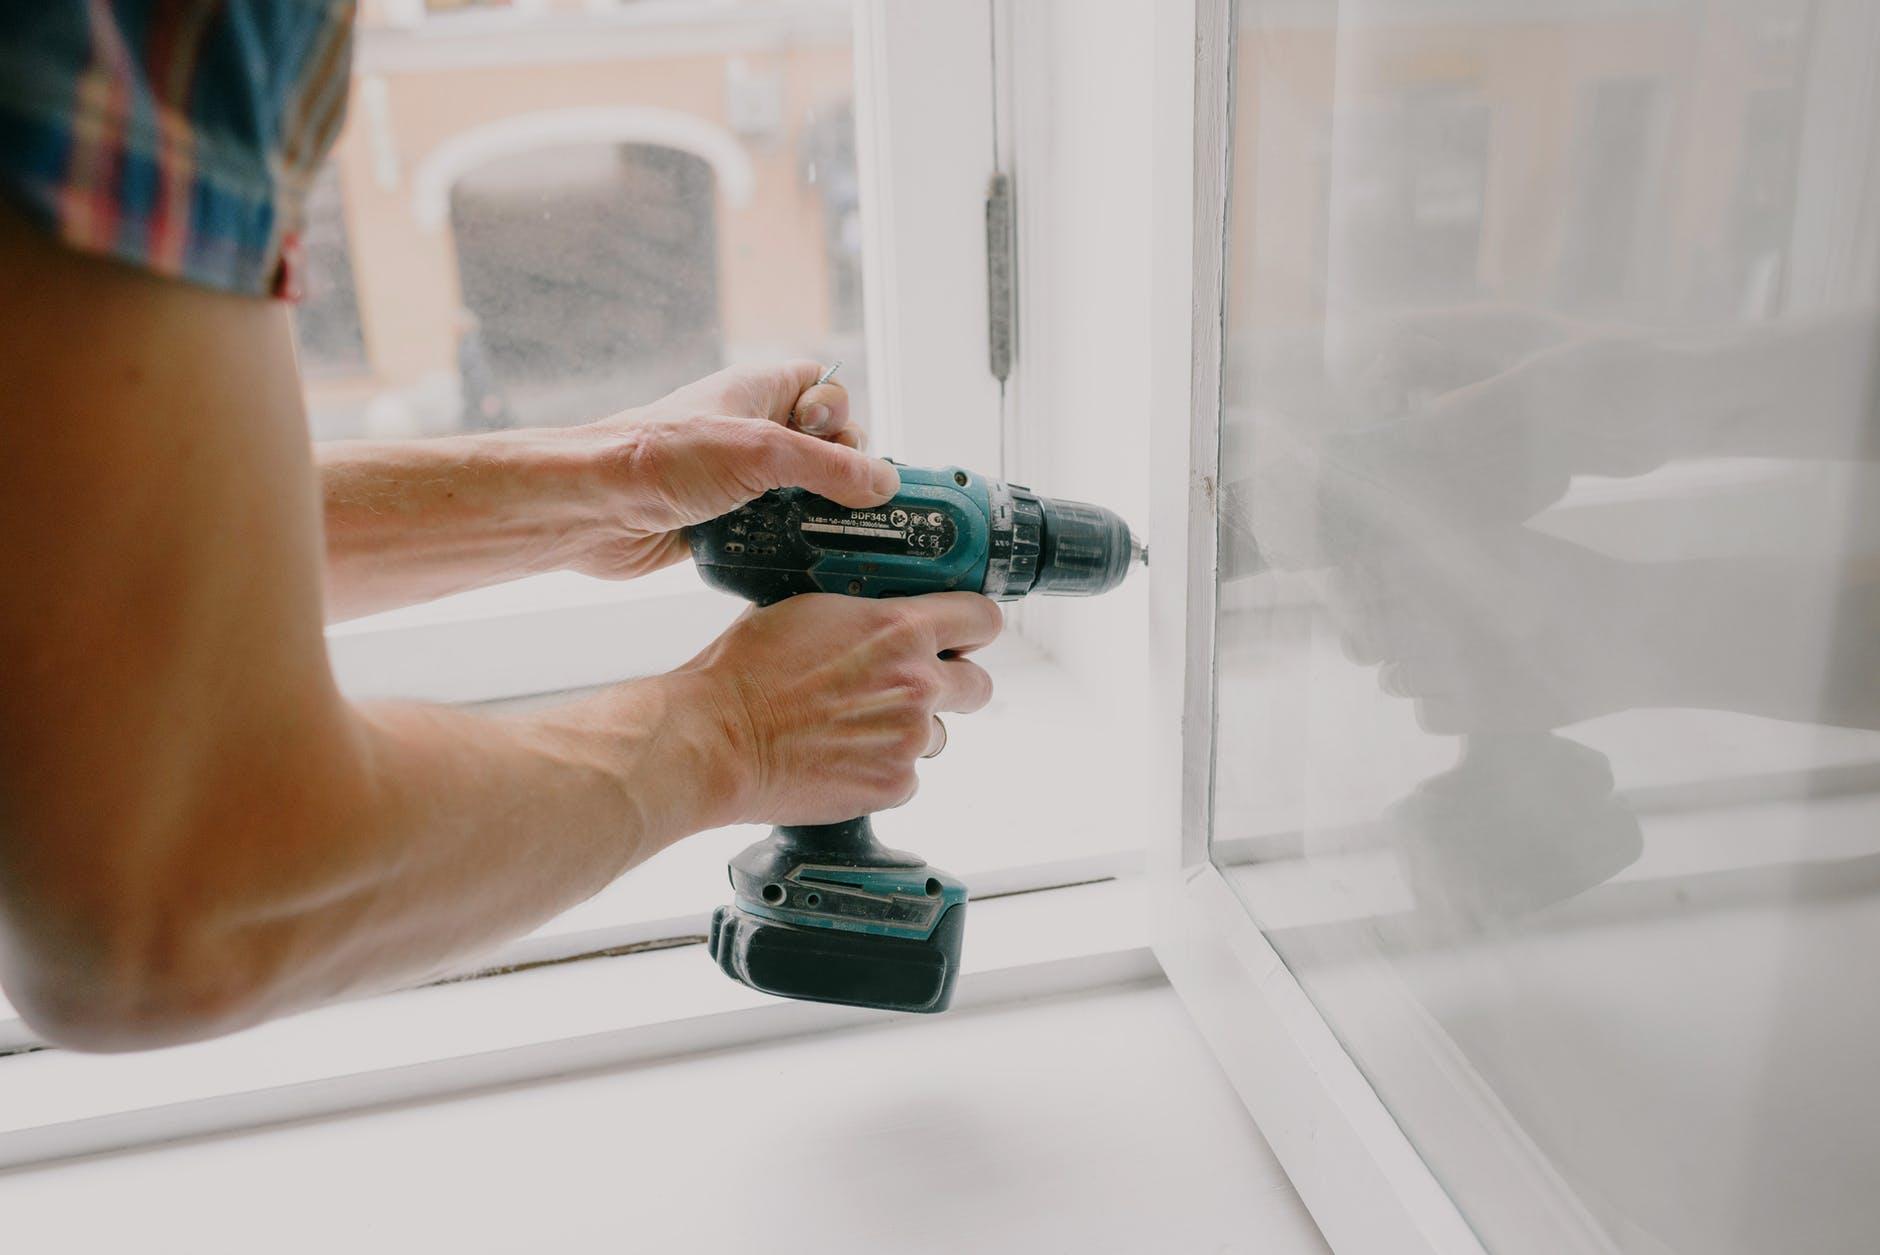 workman screwing window frame during housework